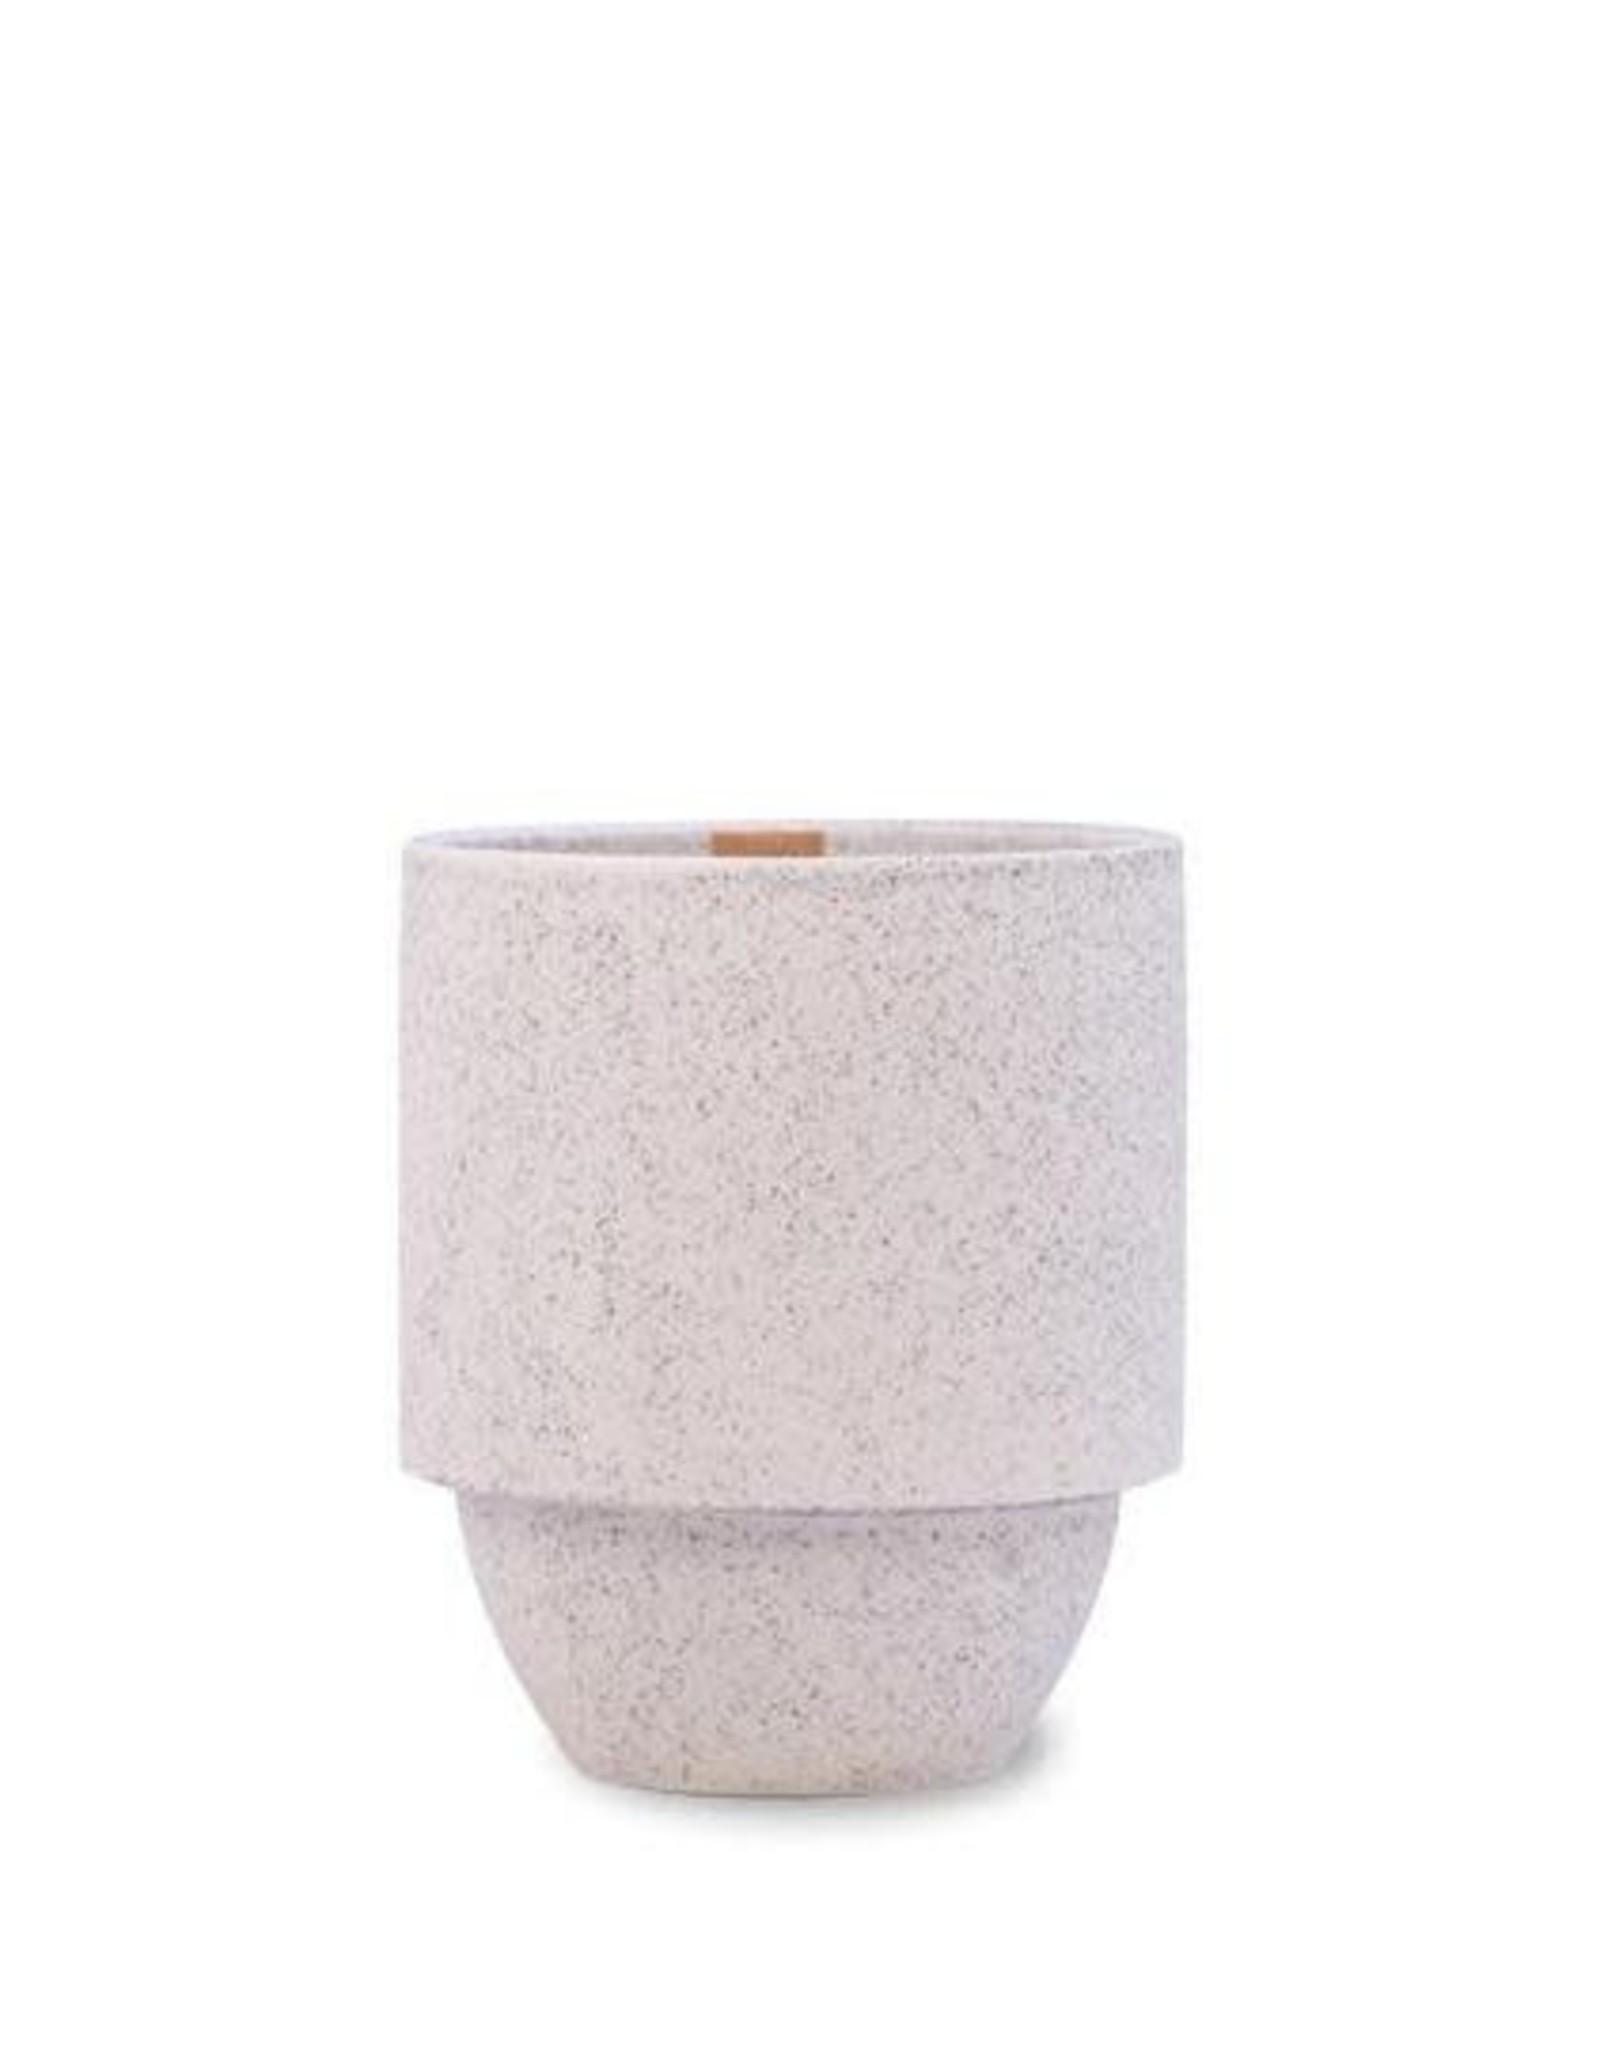 White Pine + Hemlock Candle 11 oz